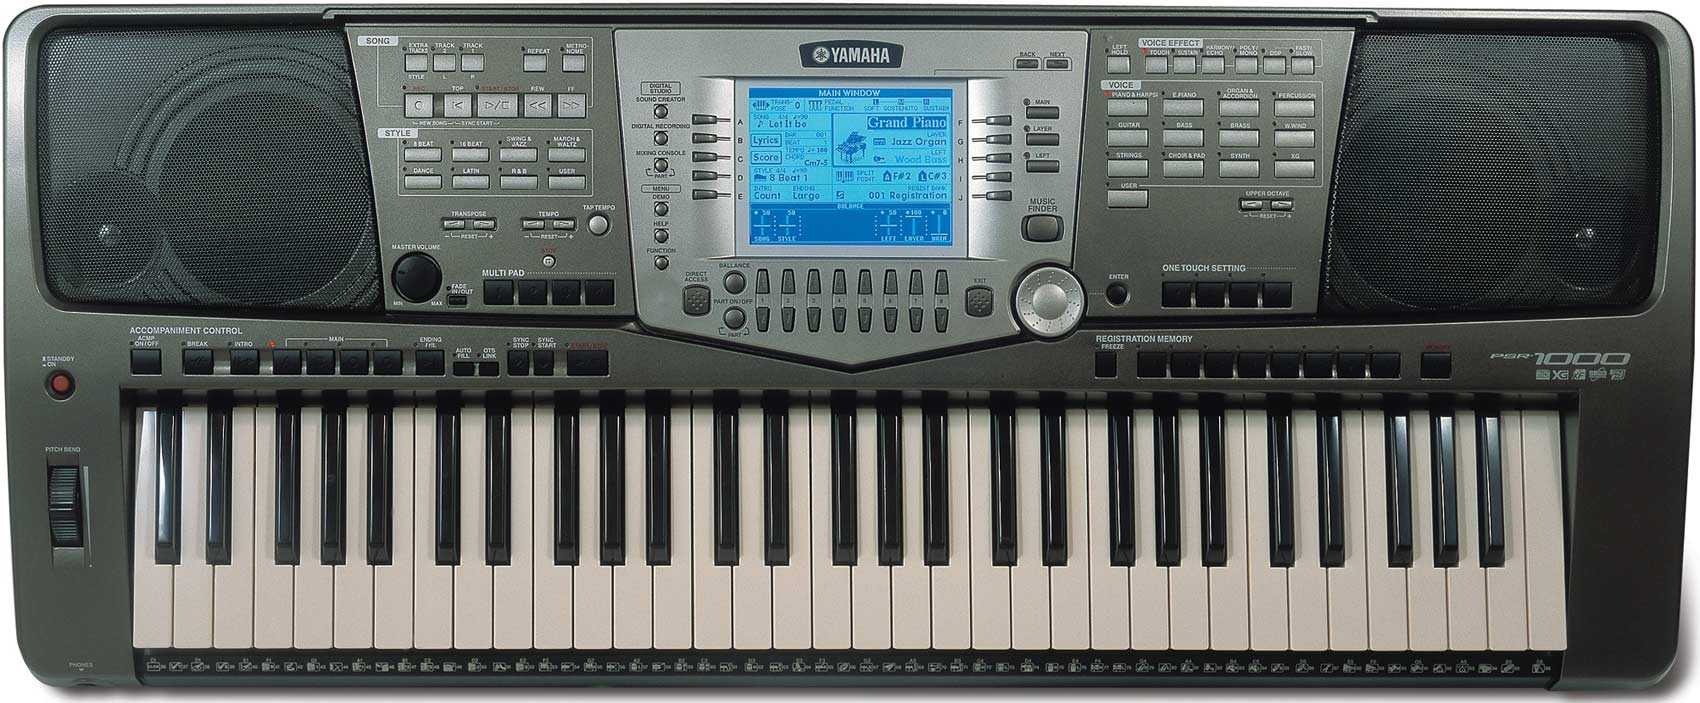 Virtual Yamaha Keyboard